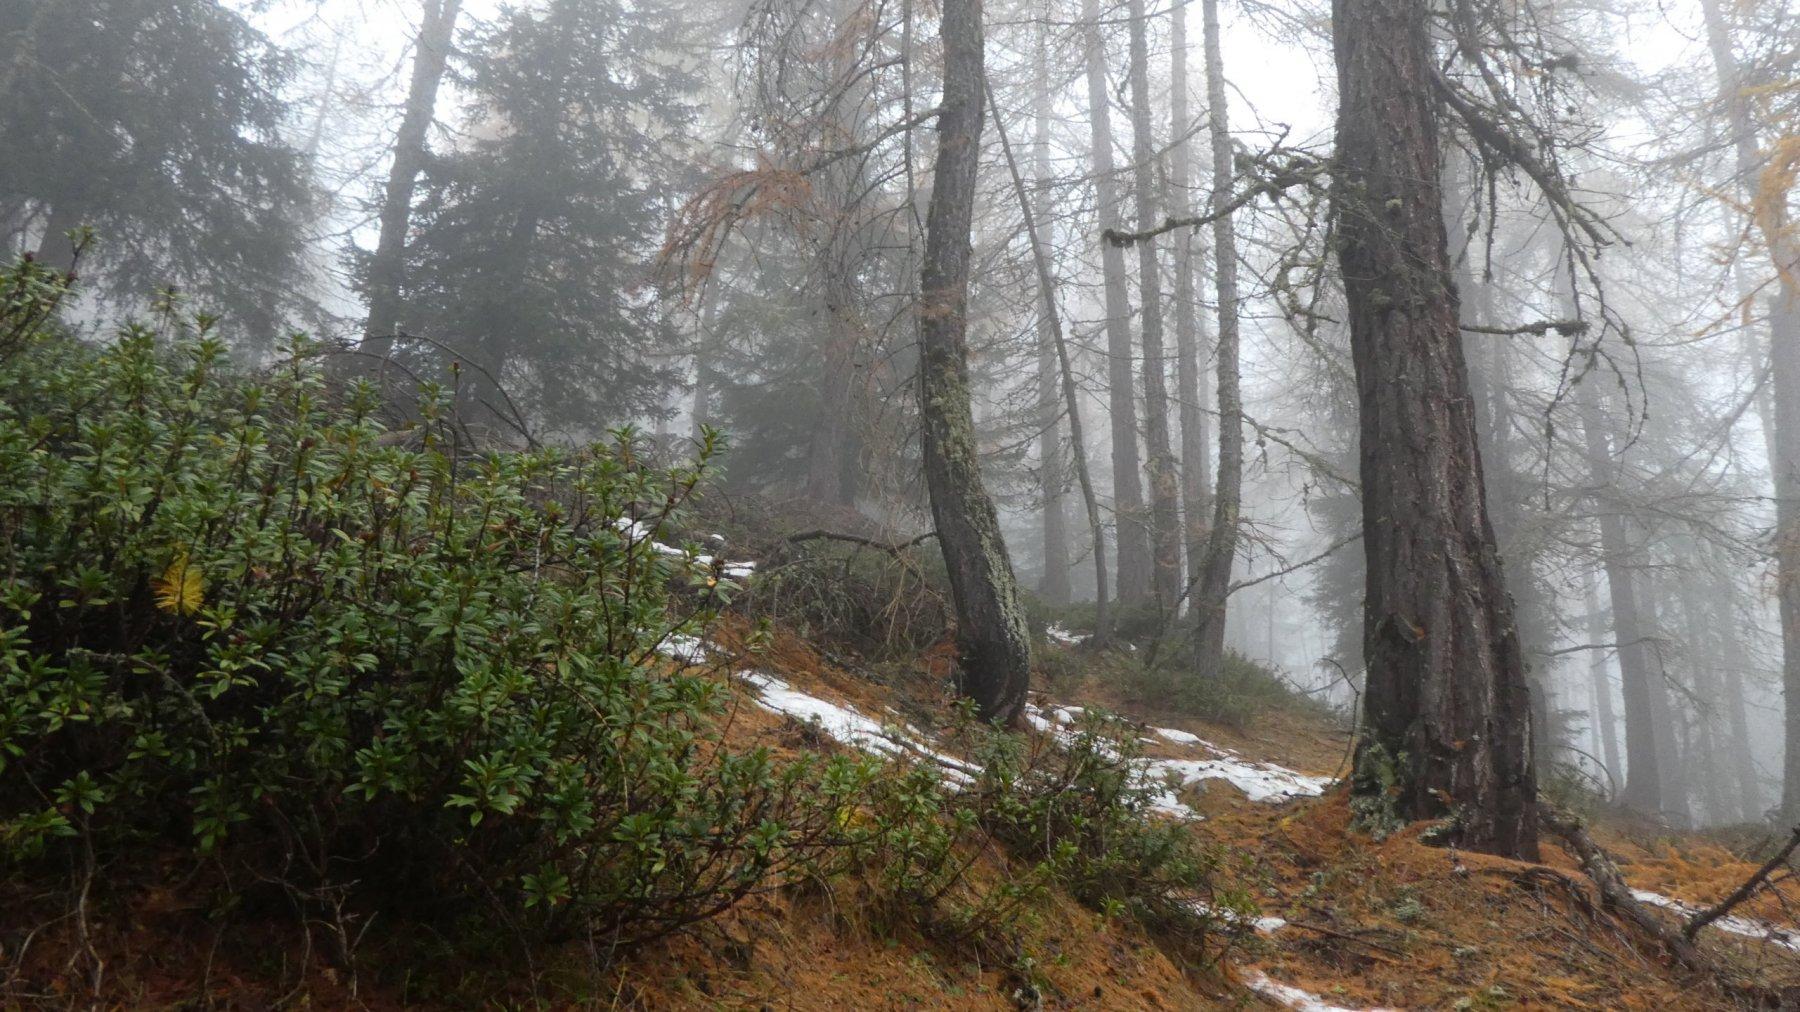 il bosco iniziale sopra Camptornè, senza neve